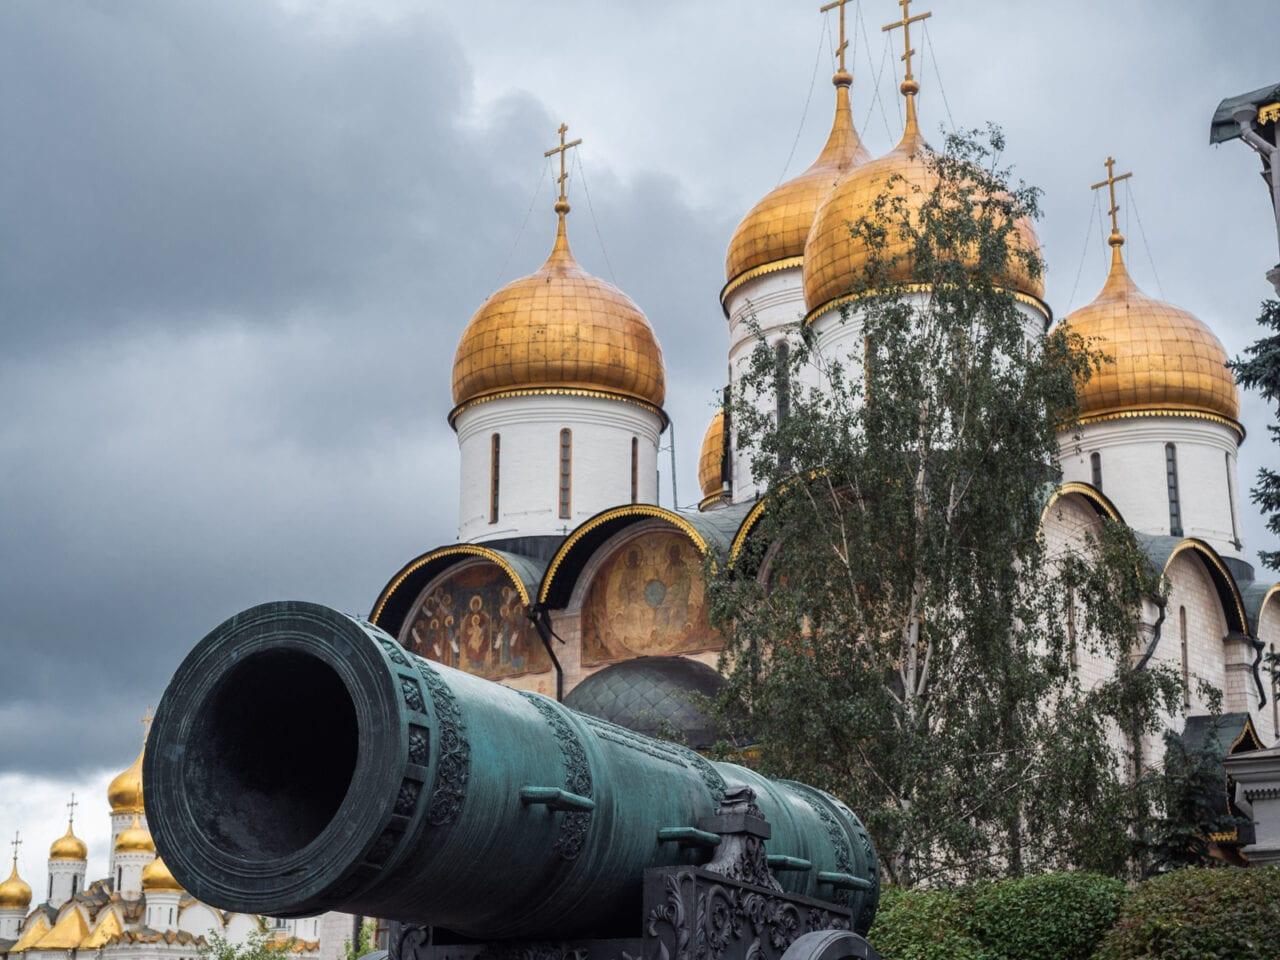 sobor i armata na kremlu